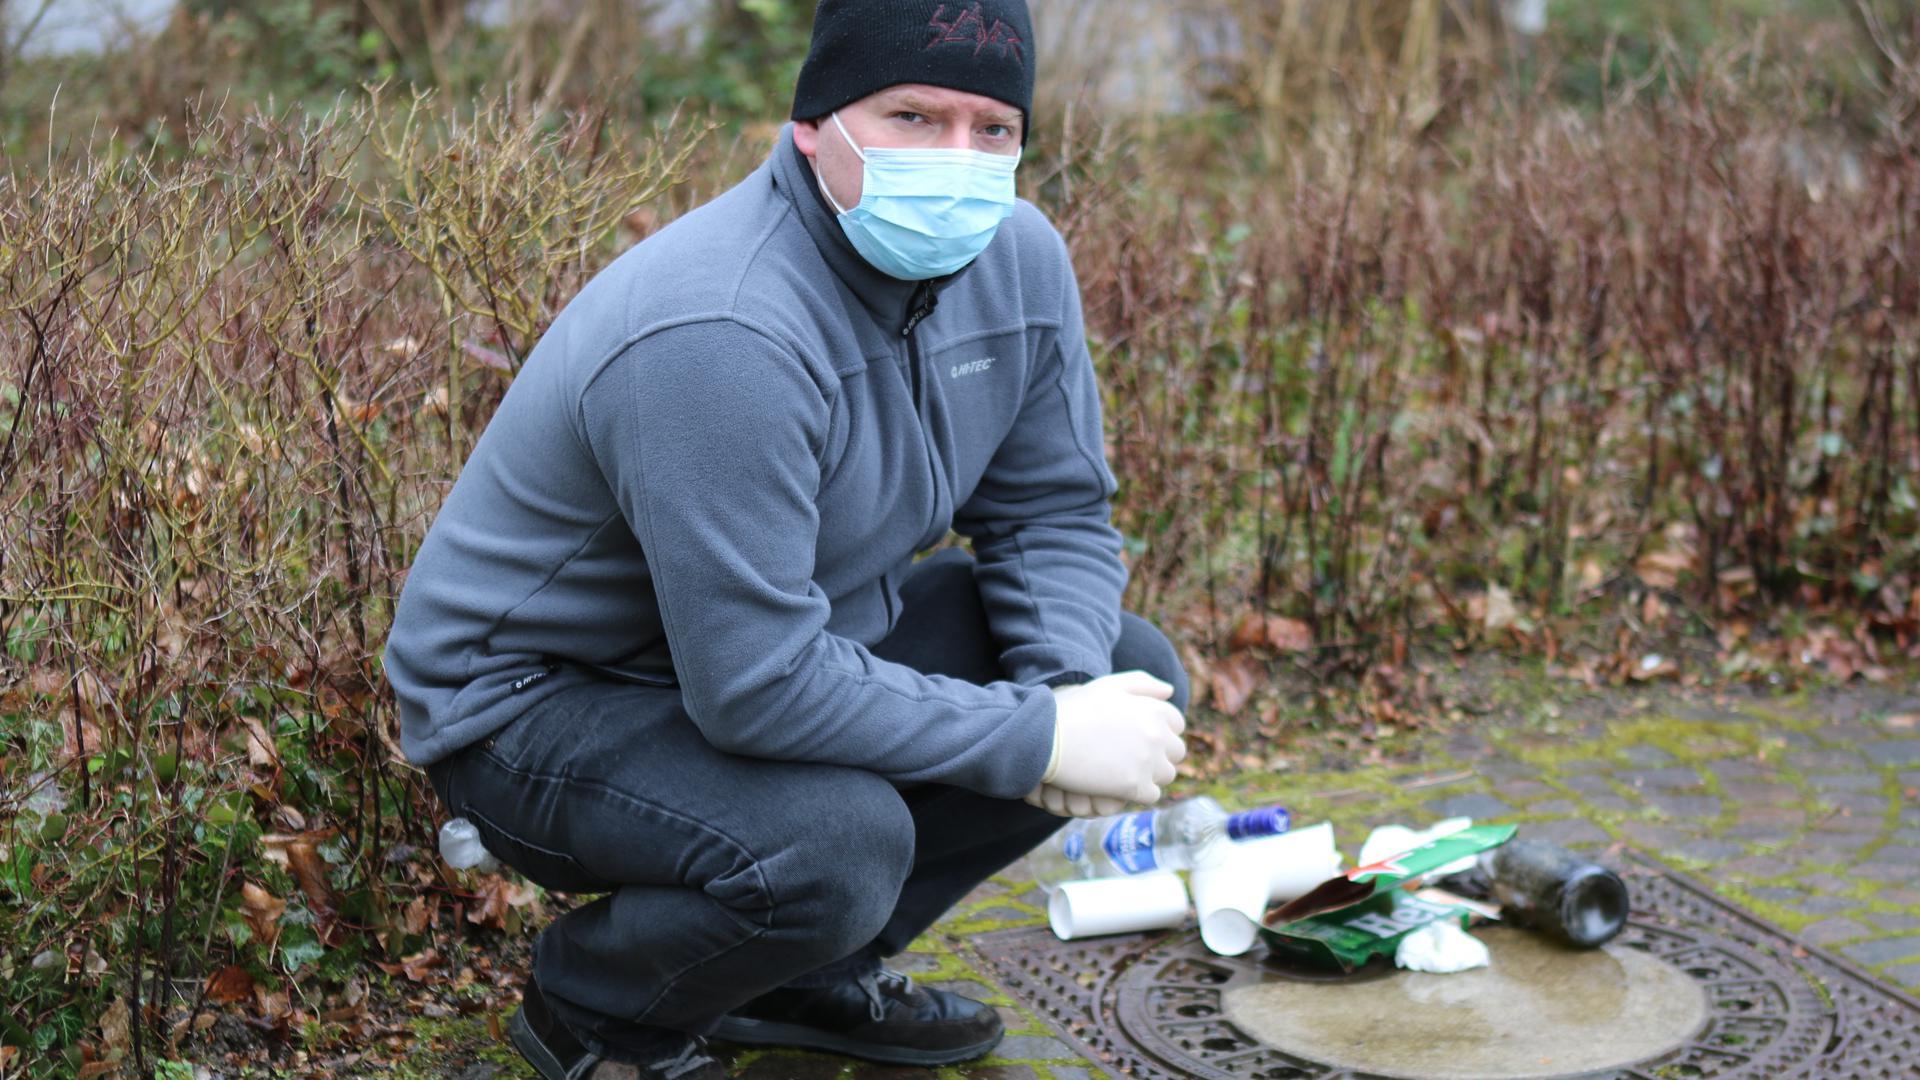 Junger Mann mit Maske vor gesammeltem Müll